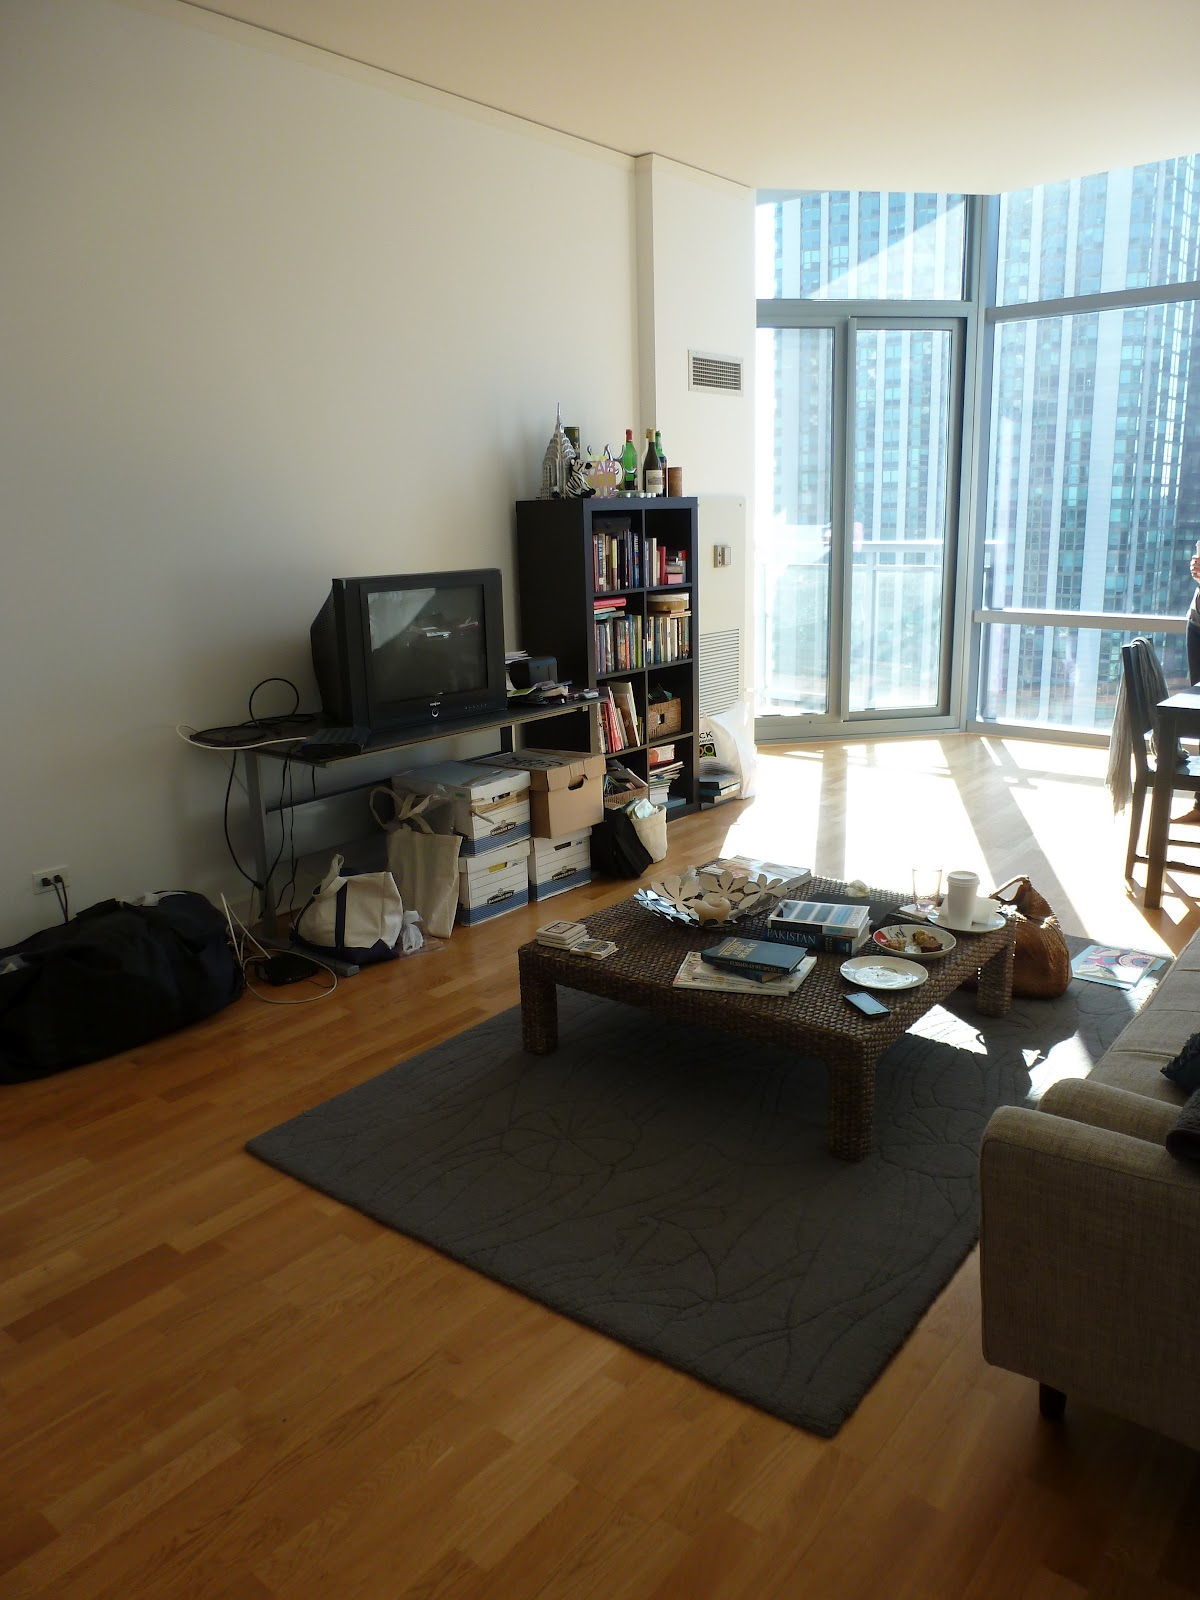 Urban Living Room: Emma's Urban Living Room: Mood Board